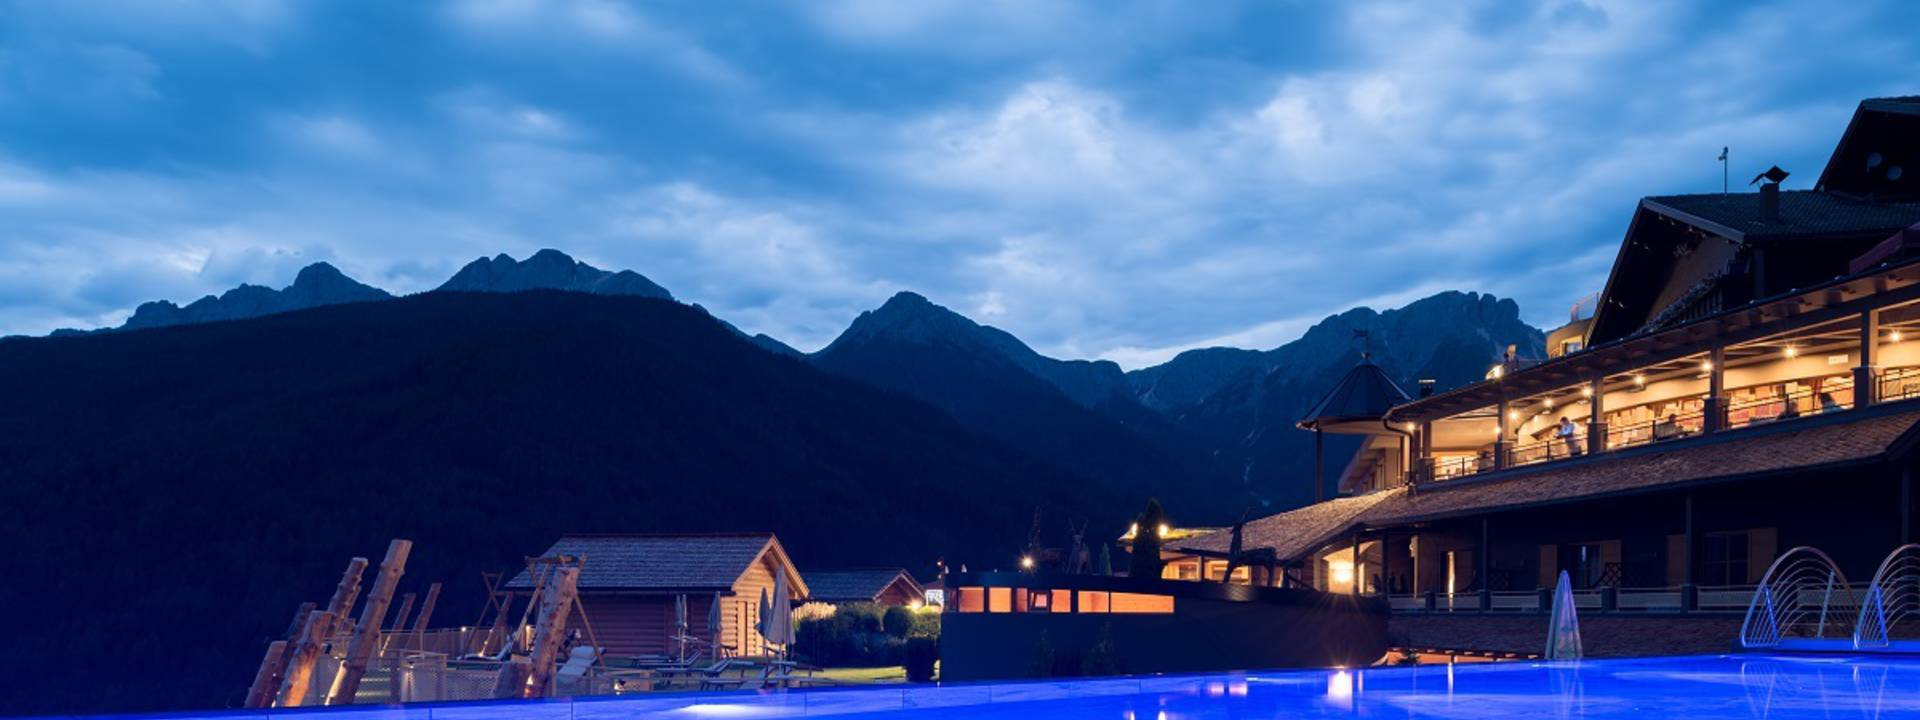 Hotel a valdaora l alpin panorama hotel hubertus for Valdaora hotel